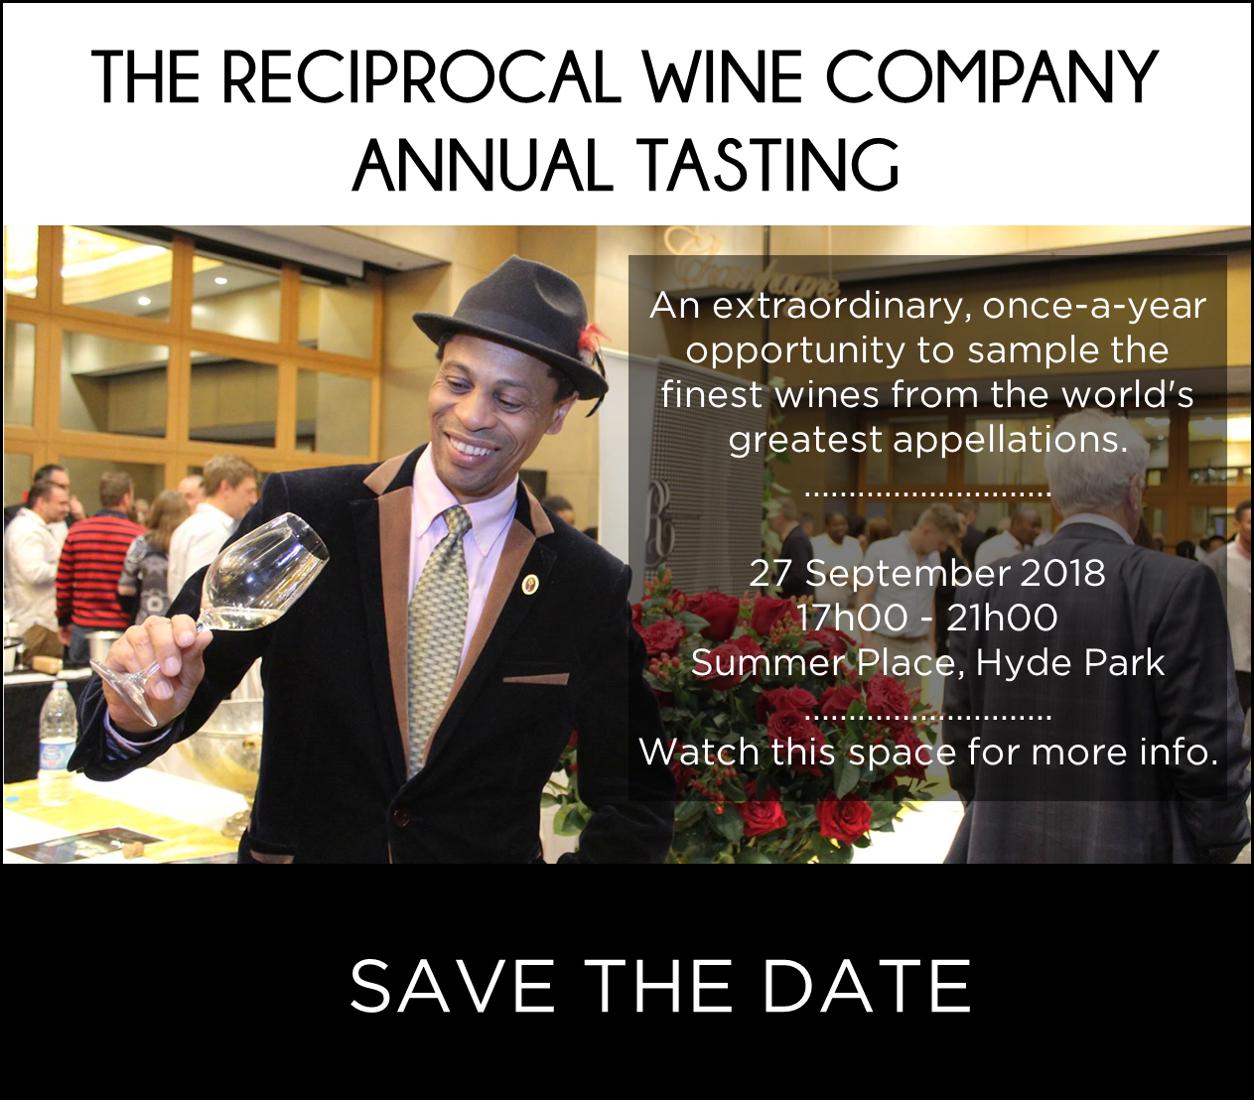 Reciprocal Wine Company Annual Tasting